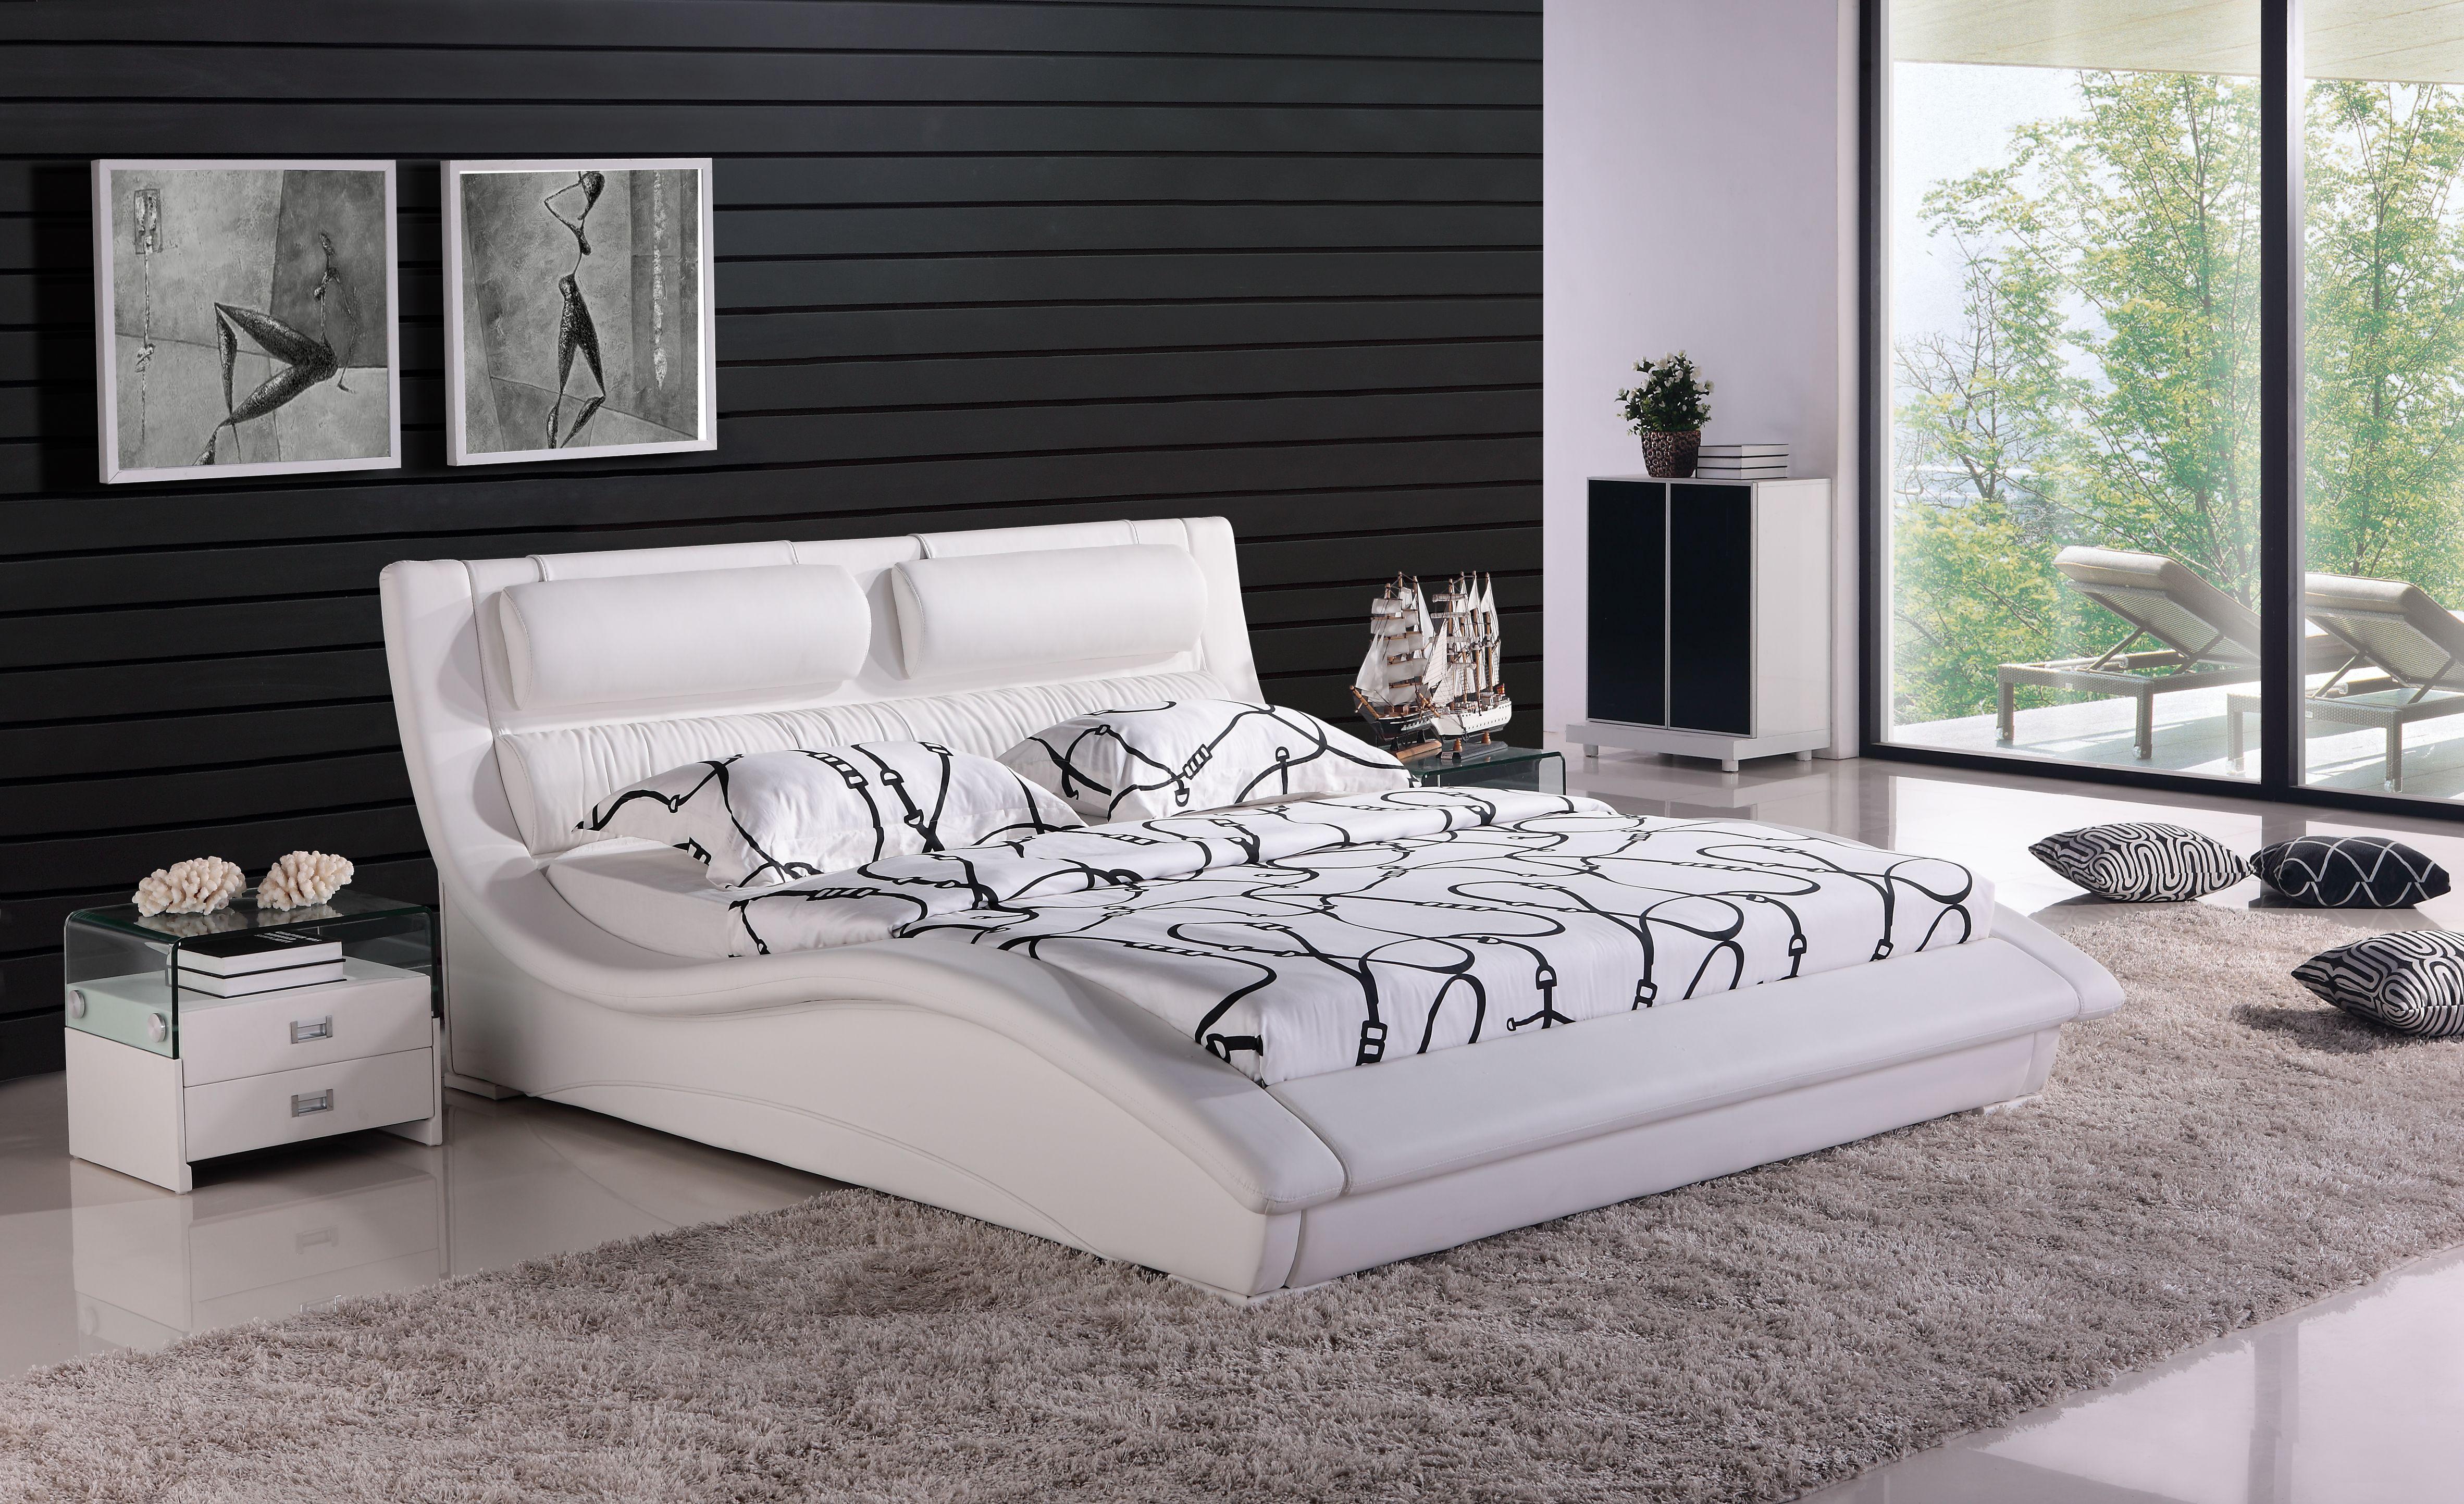 cama de matrimonio de dise o italiano modelo sumoya